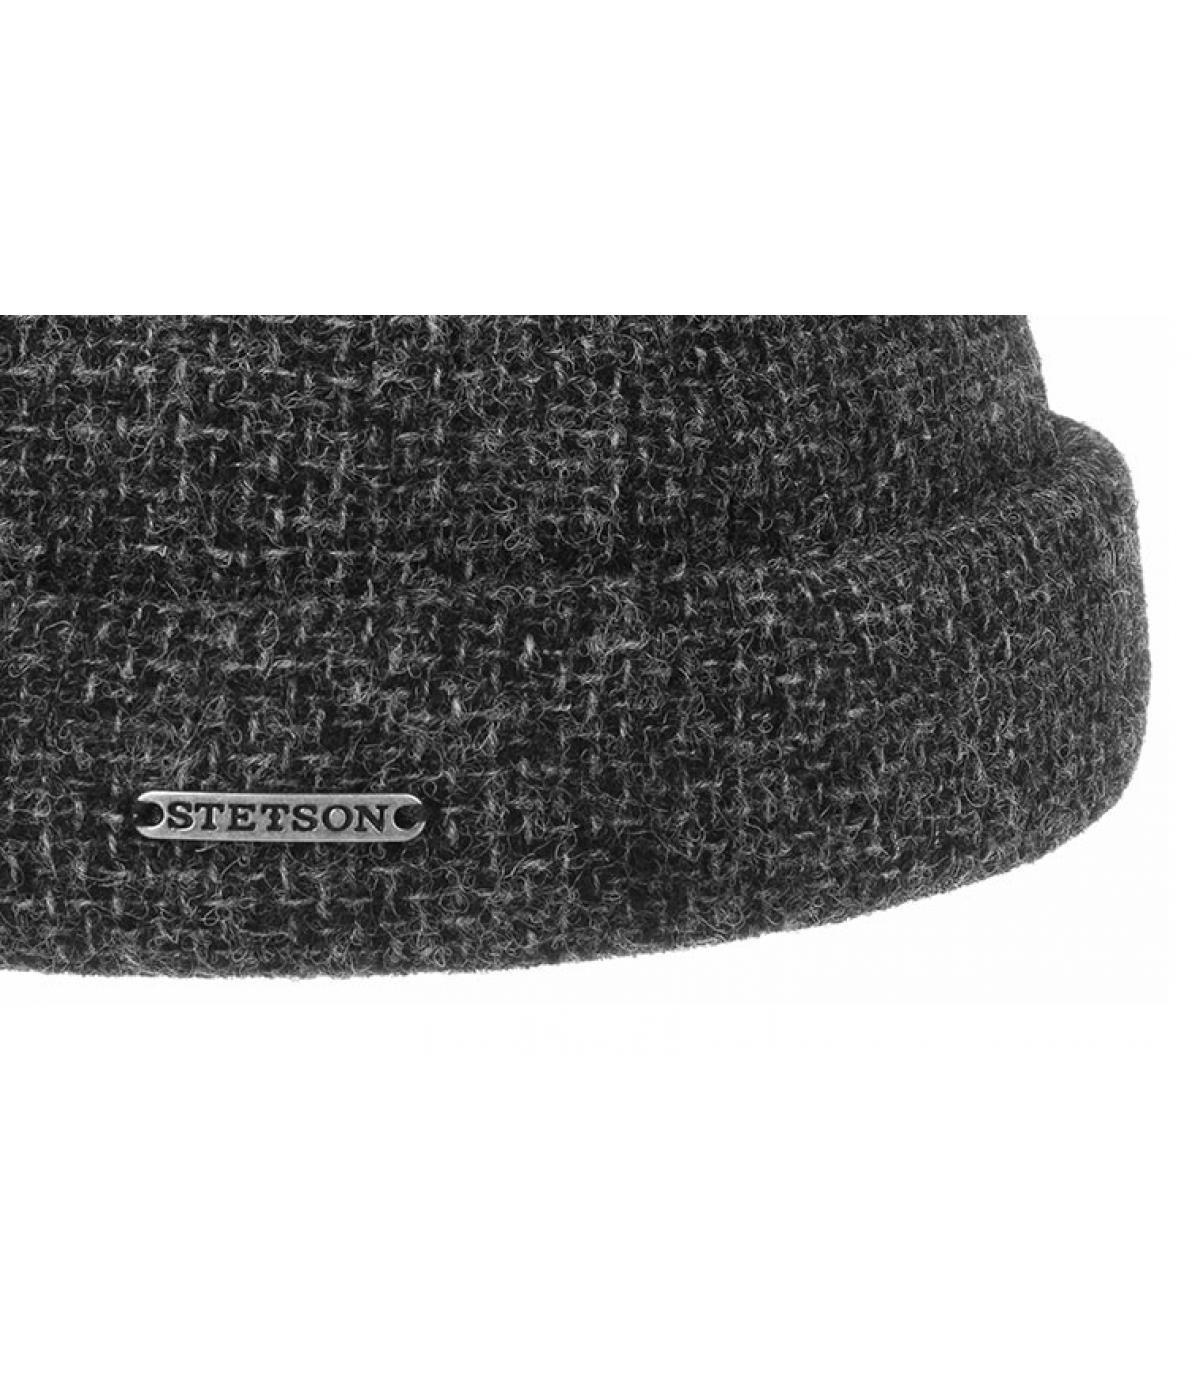 Détails Docker Wool grey - image 3